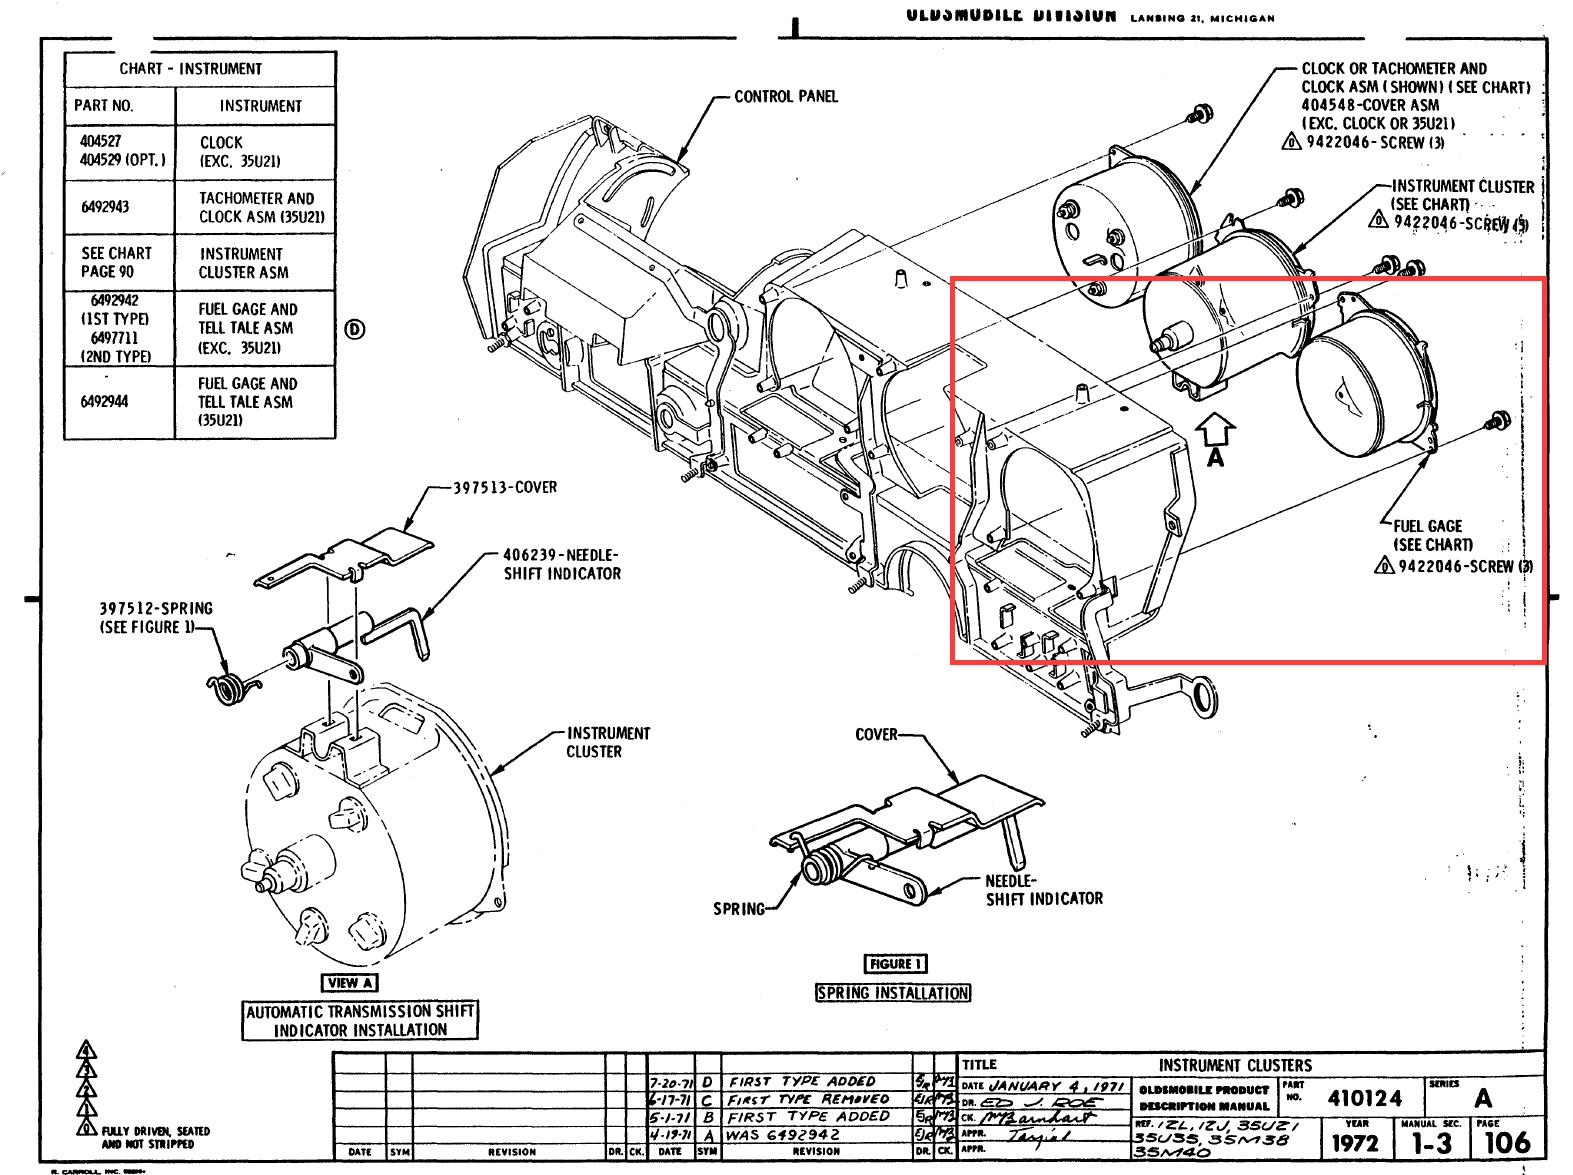 Solucionado Nissan Sentra 2001 Cruise Control No Funciona